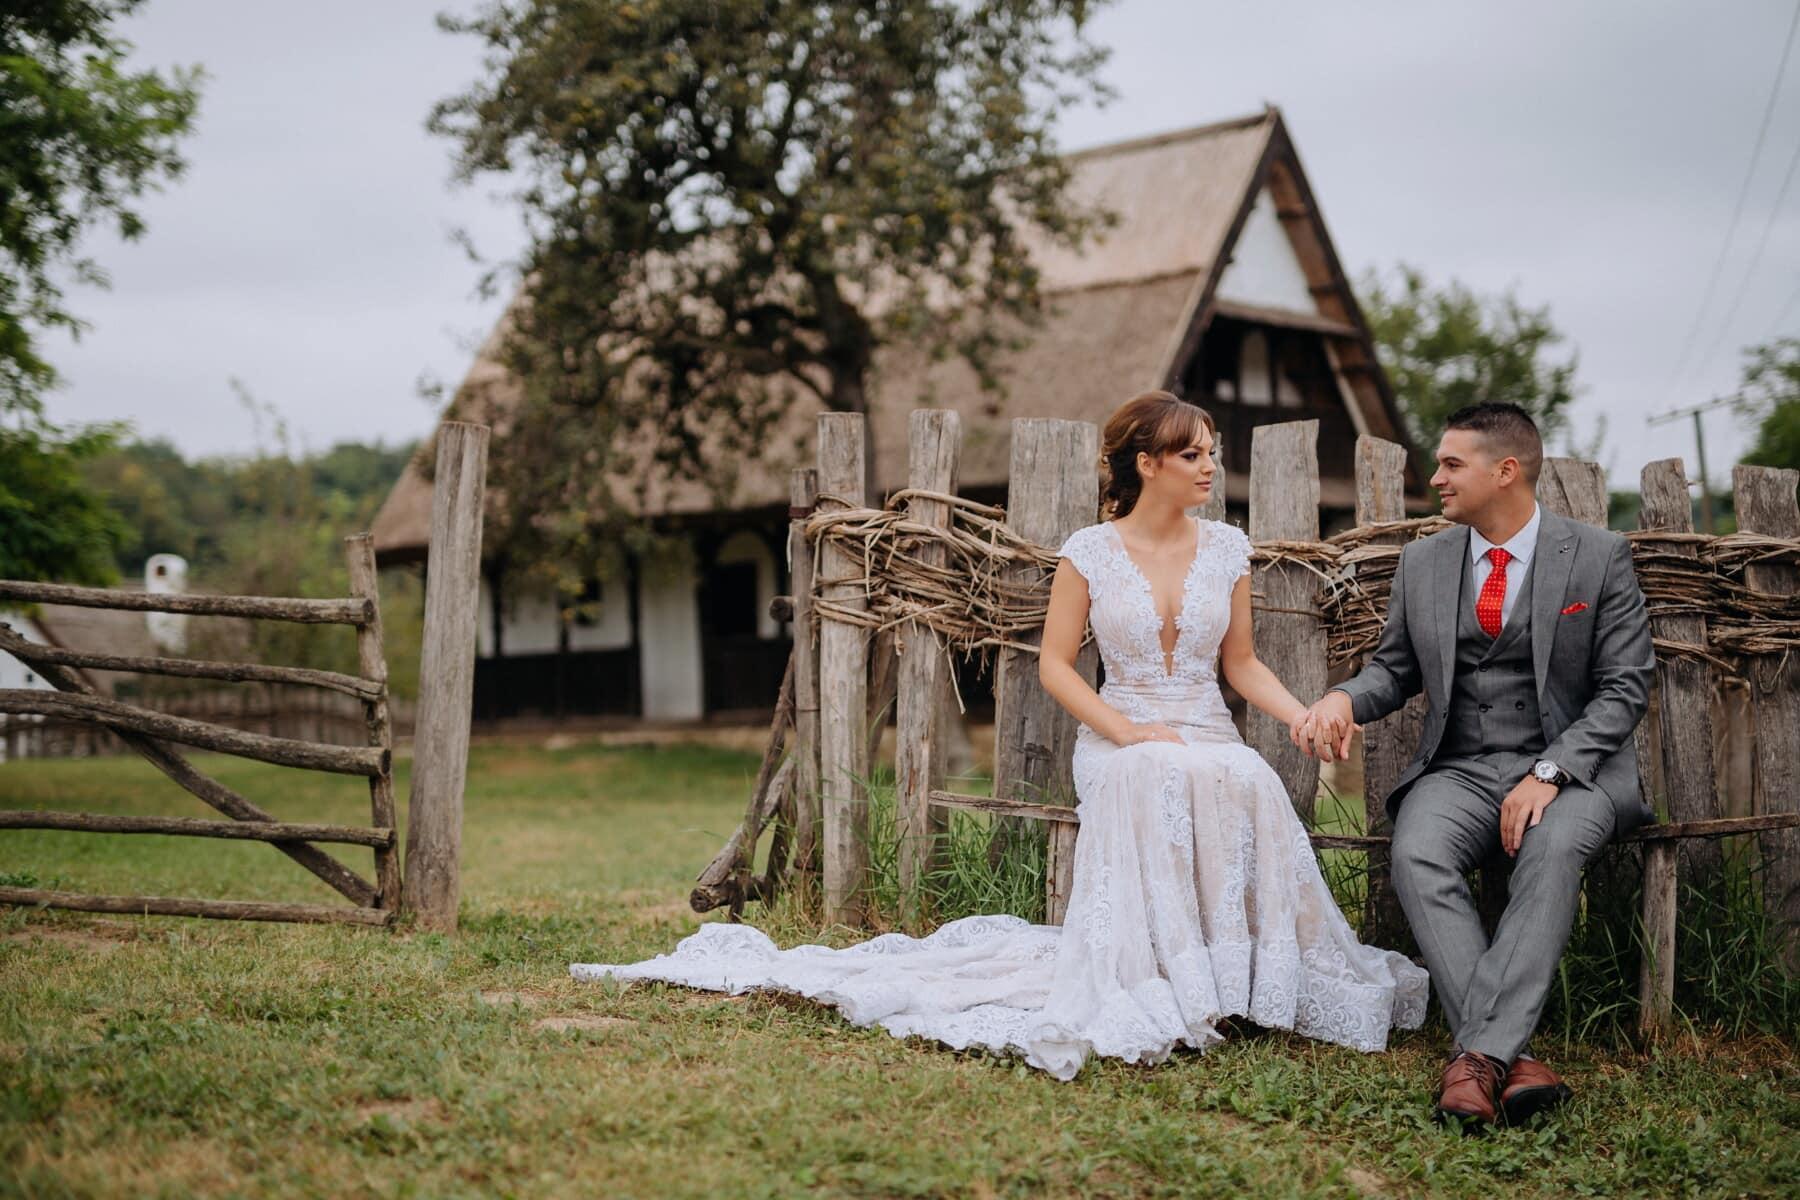 villager, village, newlyweds, cottage, dress, girl, love, married, bride, wedding